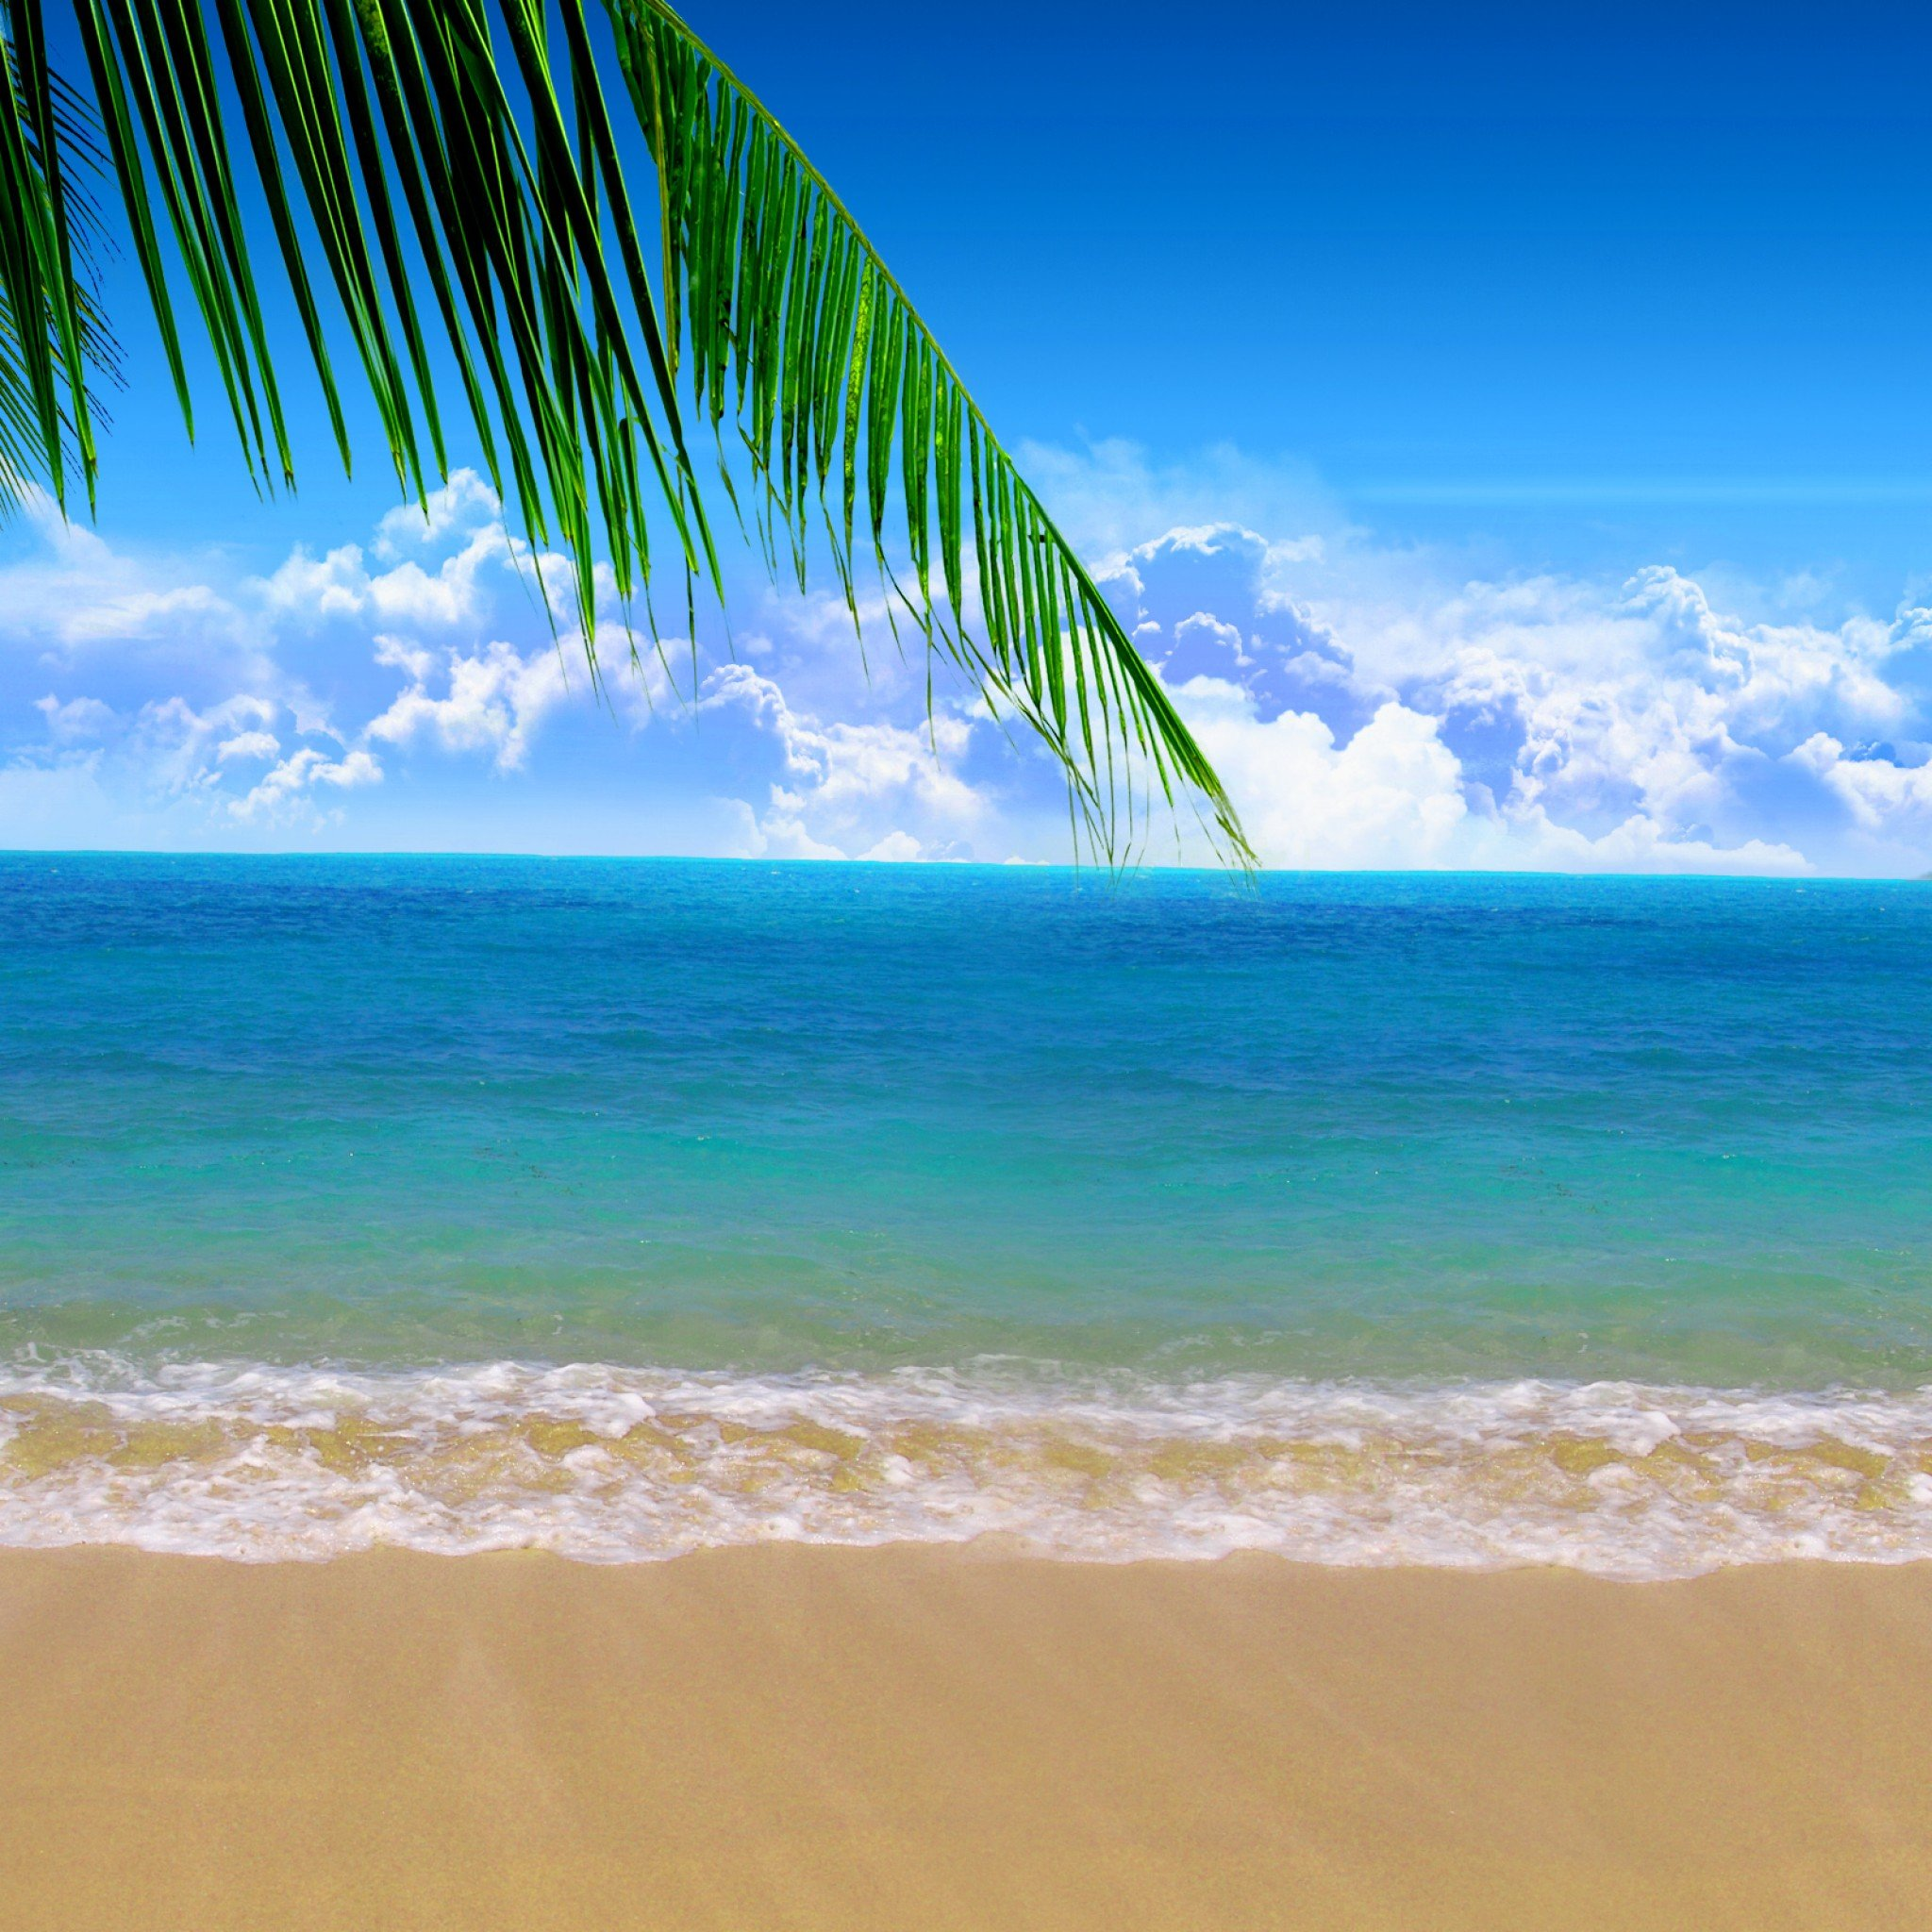 IPad Wallpaper Beach Scenes